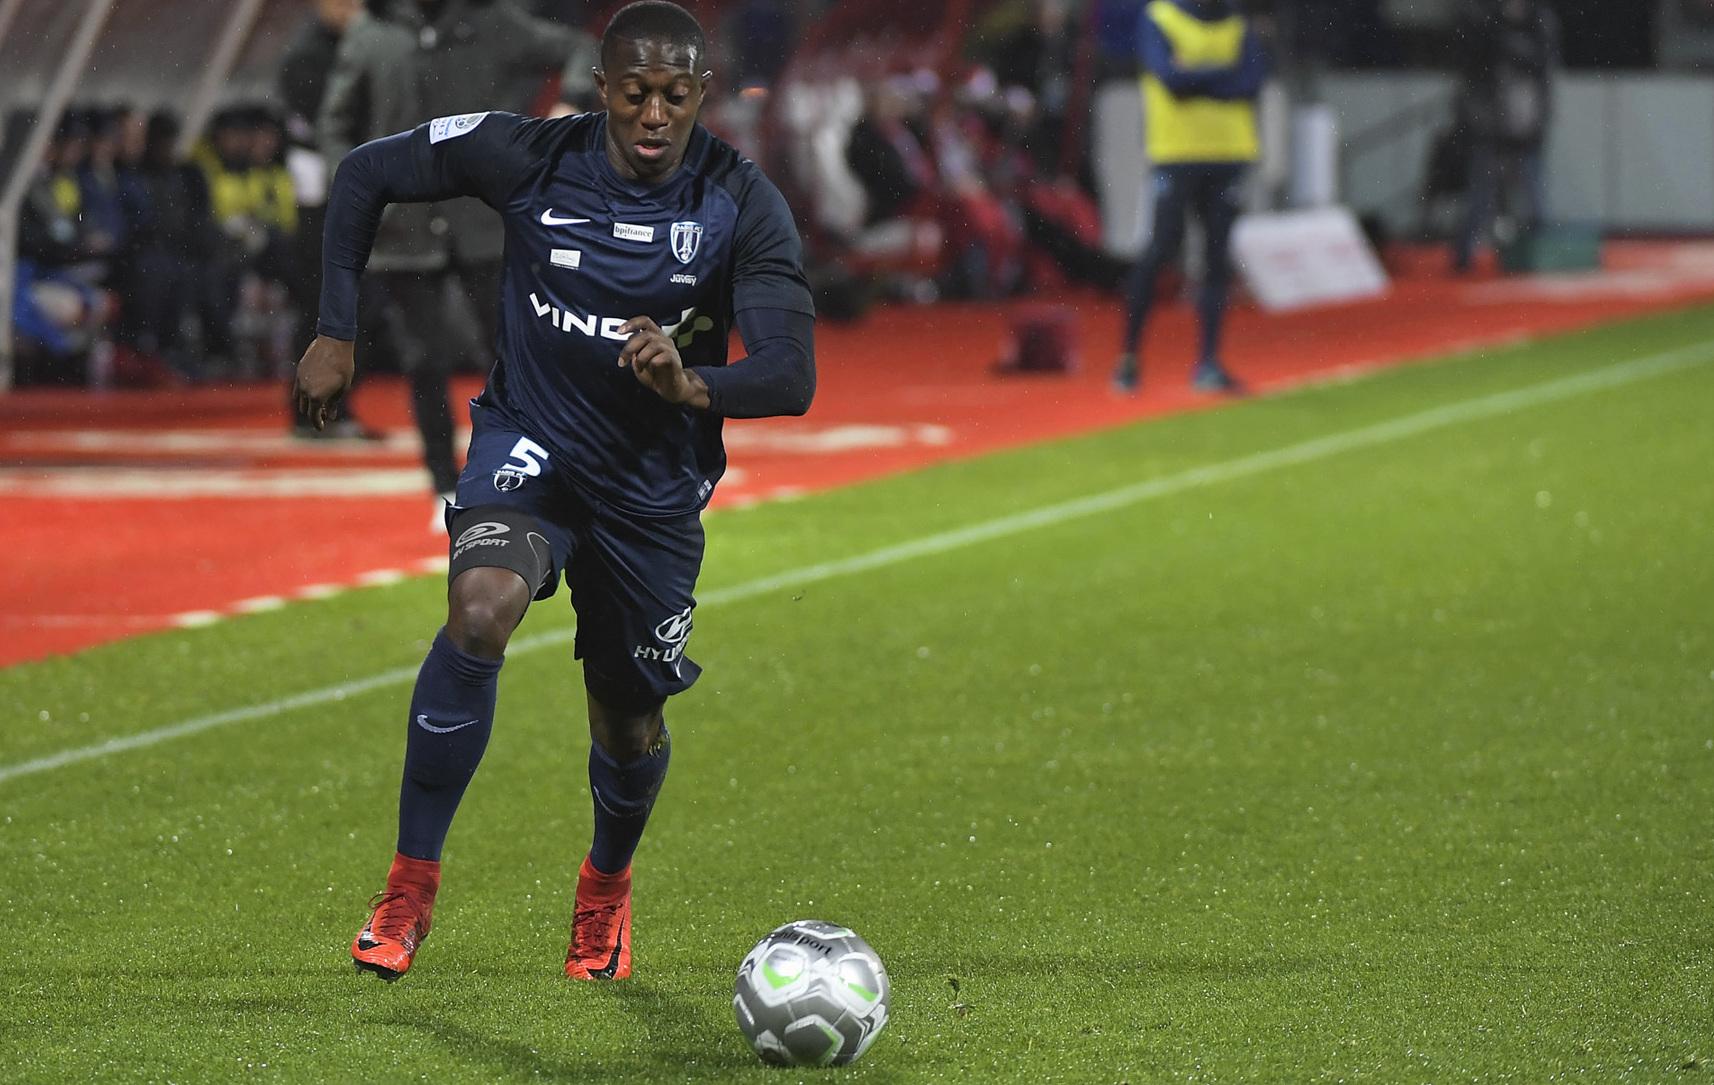 Football - Ligue 2 - Ligue 2 : Paris FC-Ajaccio en direct